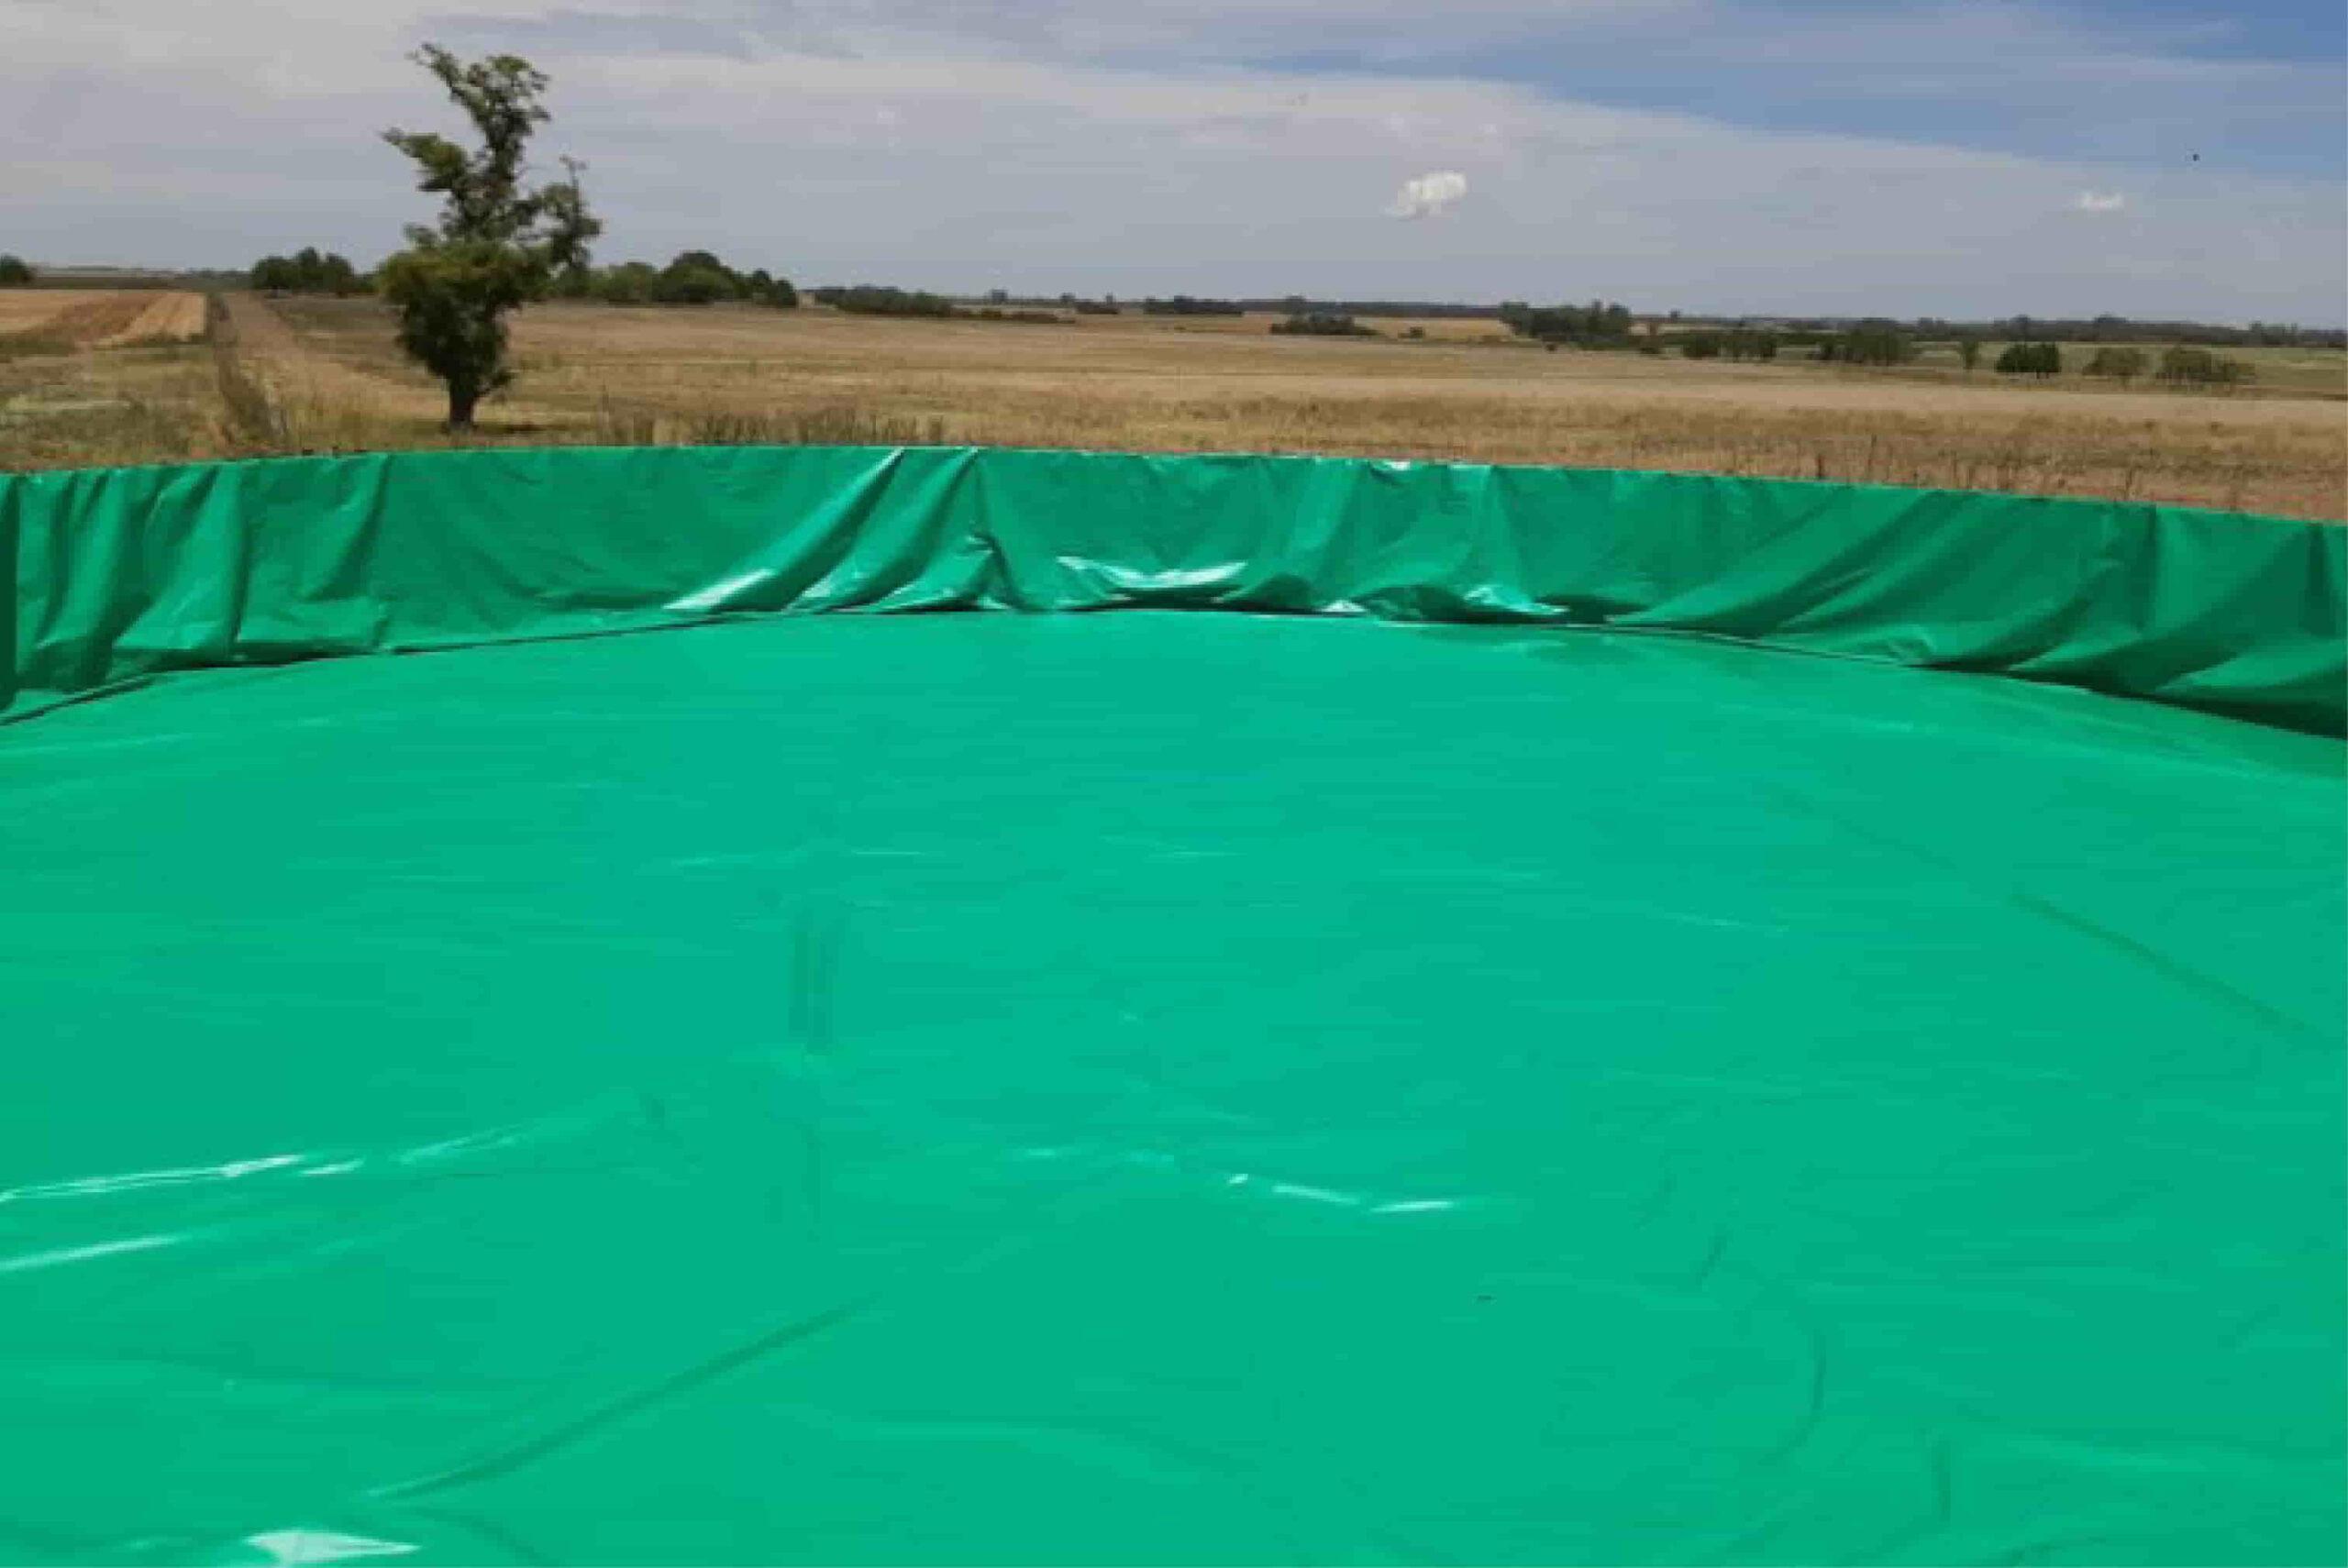 funda verde para tanque australiano